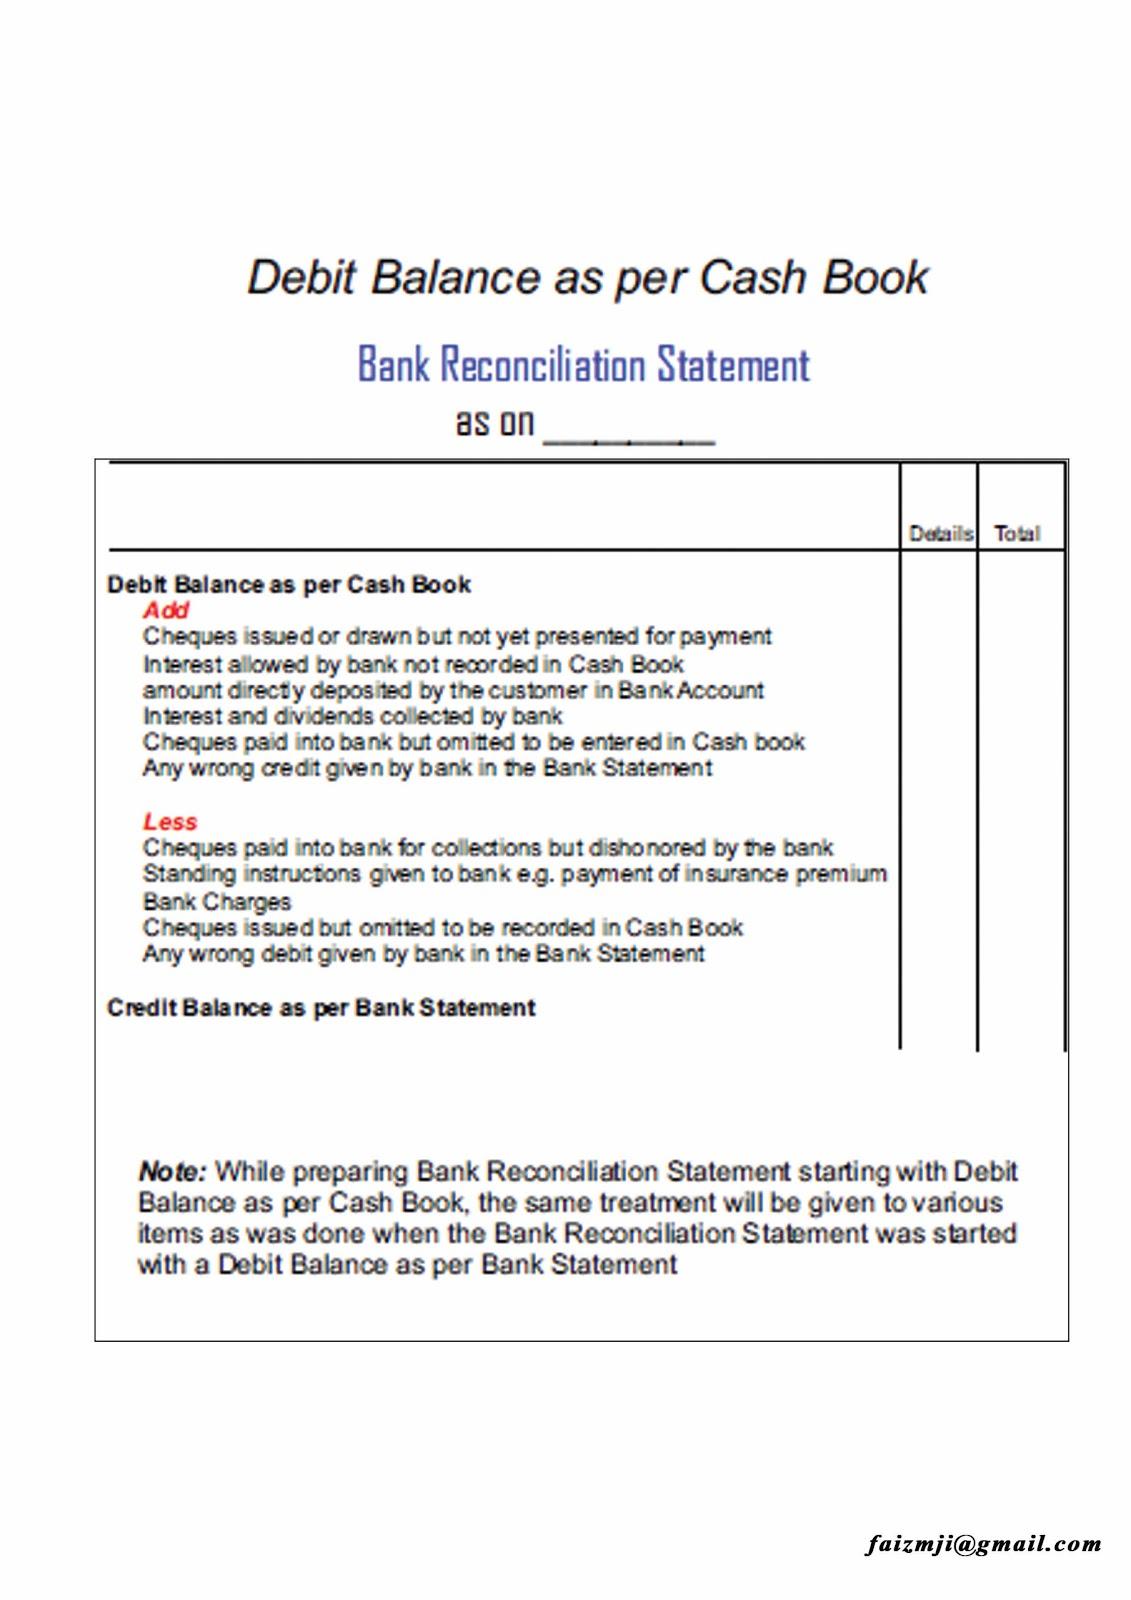 bank reconciliation statement format